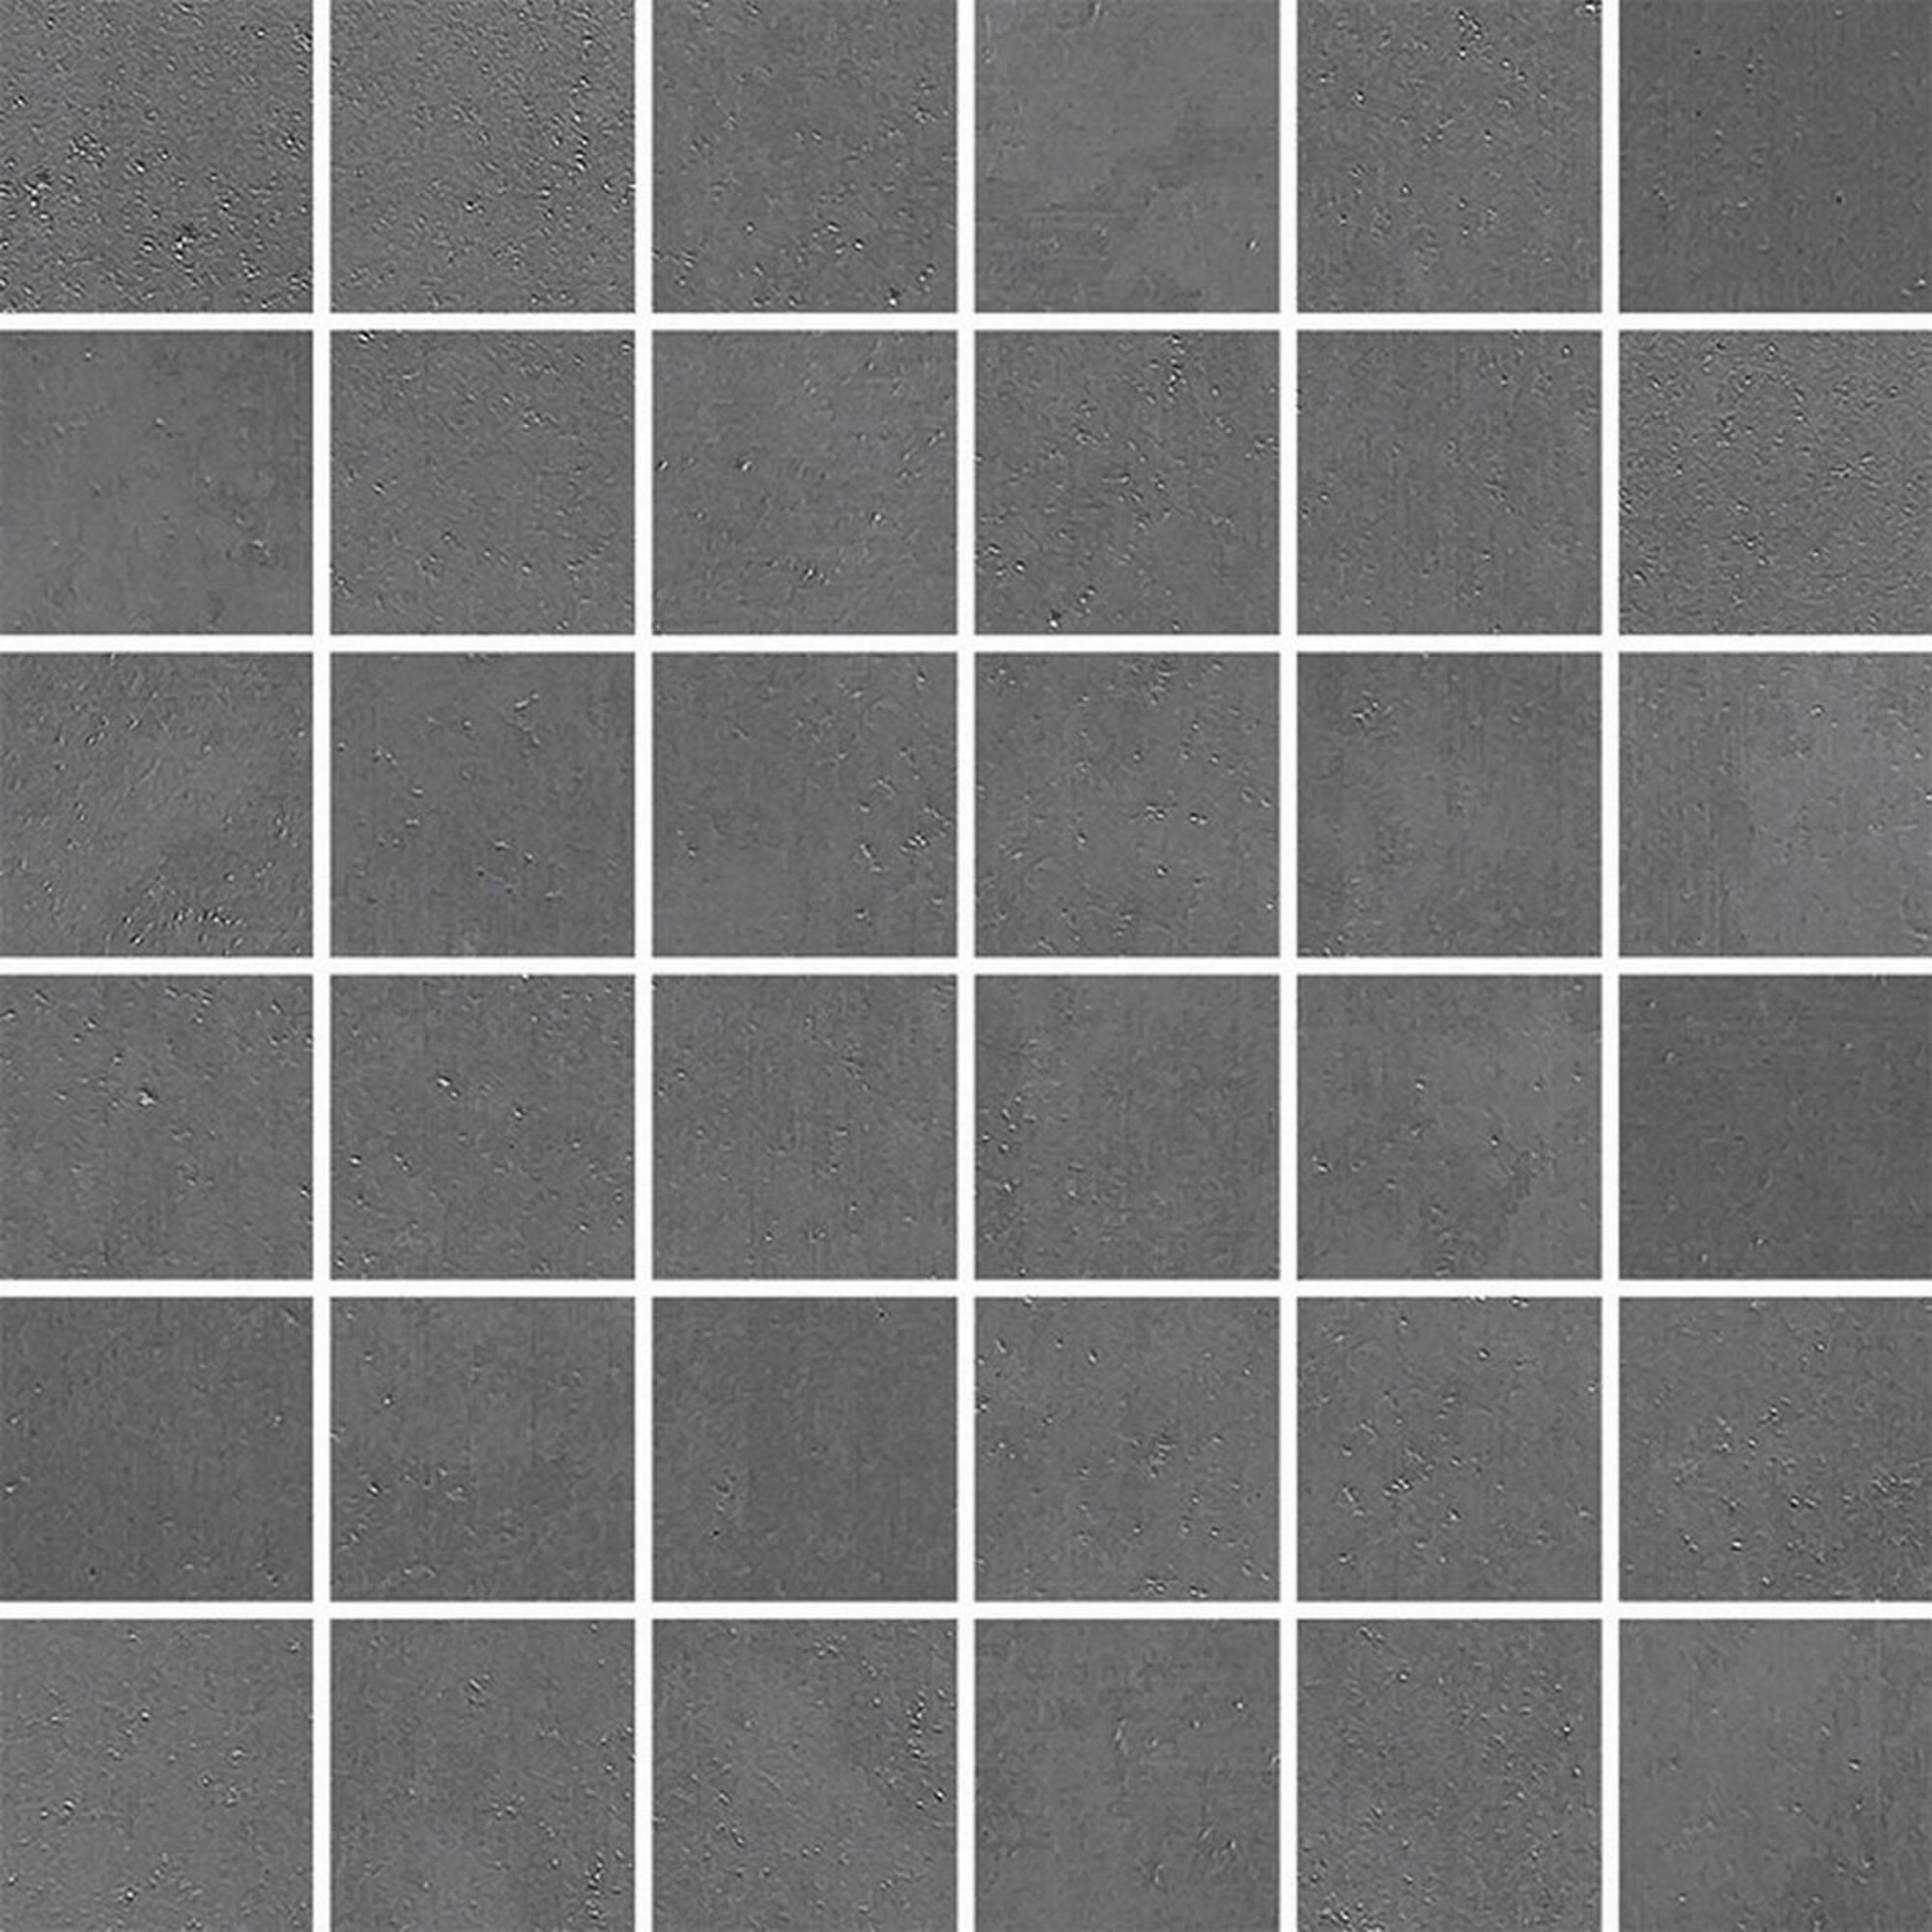 Villeroy & boch Century unlimited tegelmat 30x30 cm. blok 5 x 5 cm. a 11 stuks, donker grijs